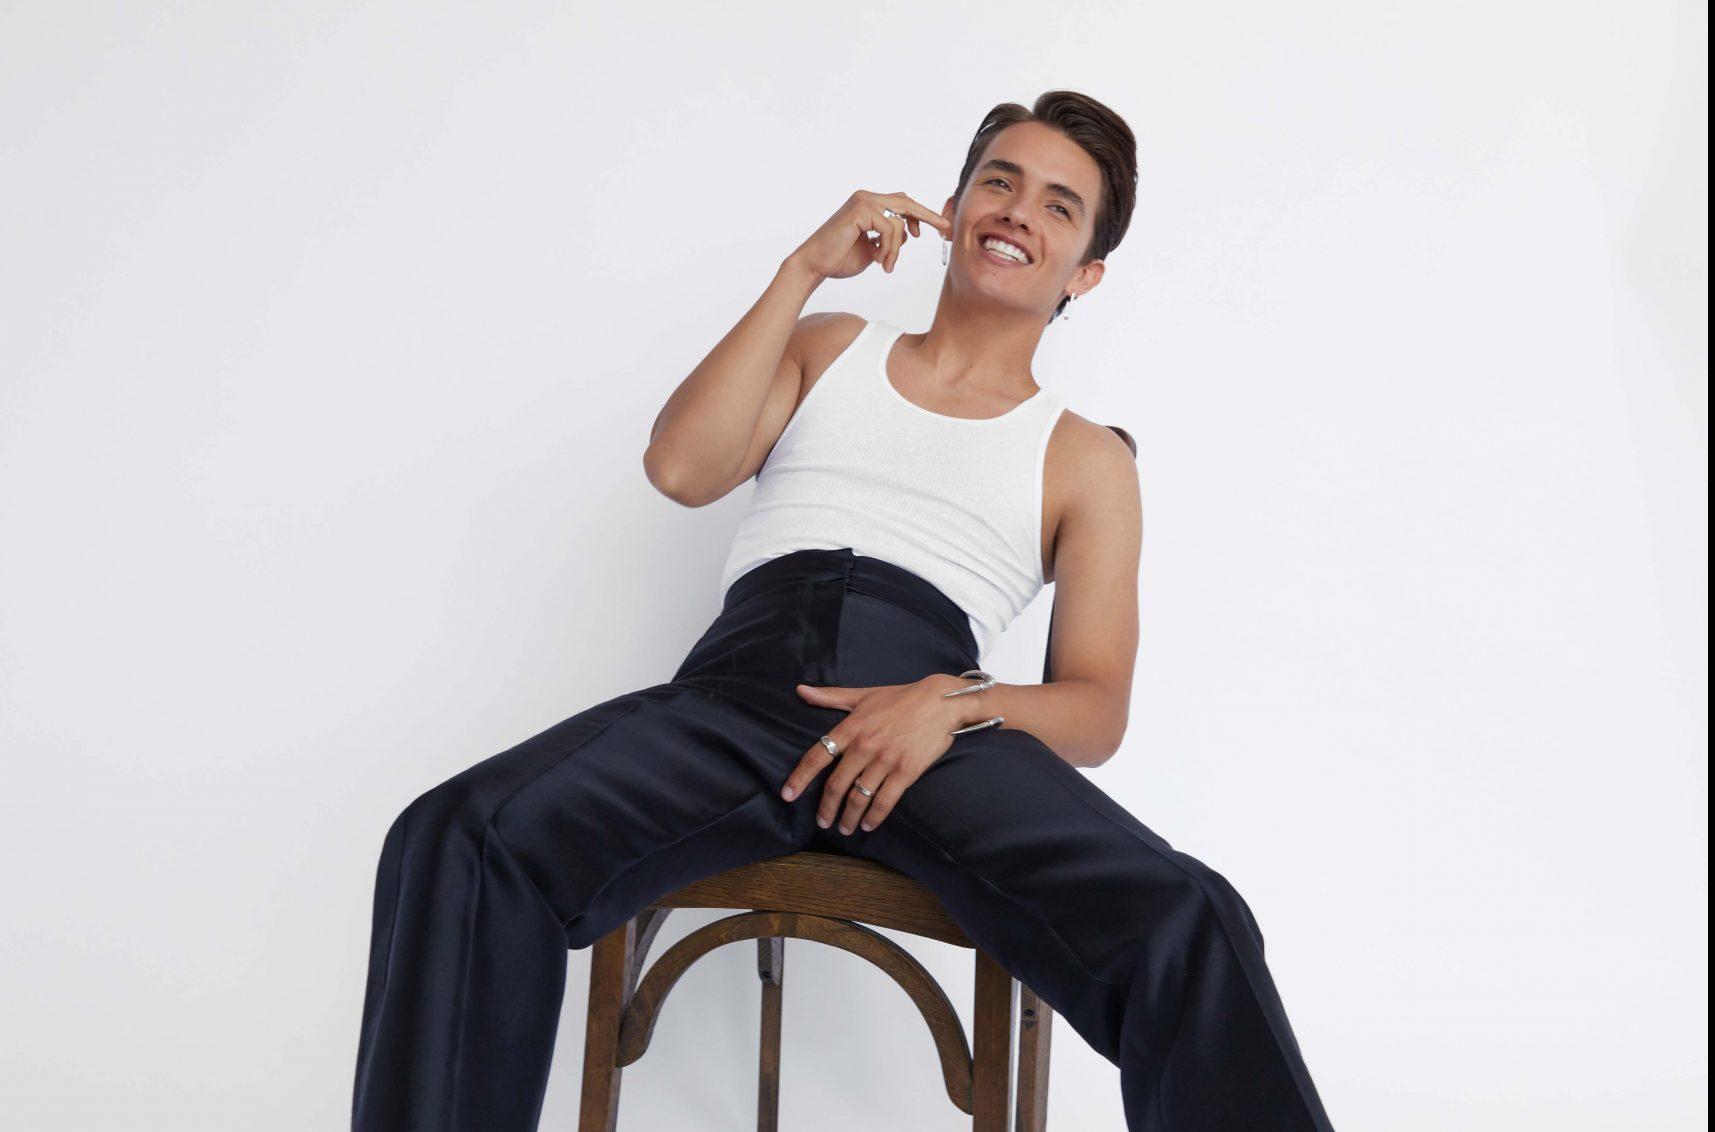 Noah Urrea: I Enjoy Putting Smiles On People's Faces Noah Urrea: I Enjoy Putting Smiles On People's Faces Vanity Teen 虚荣青年 Menswear & new faces magazine